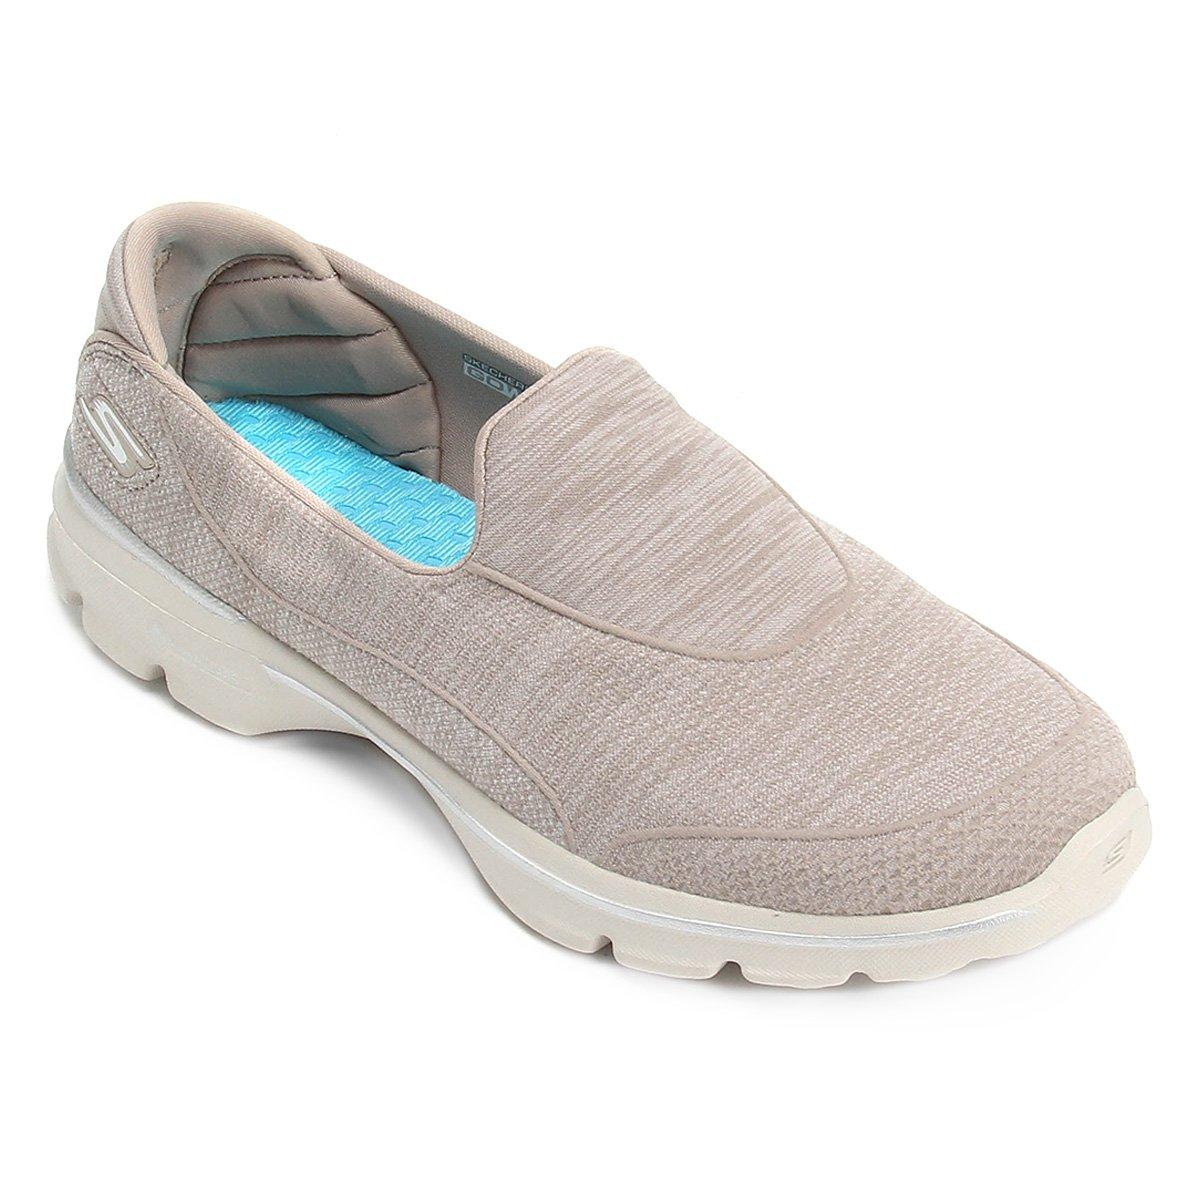 d3de0480c9 Sapatilha Skechers Go Walk 3 - Super So Feminina